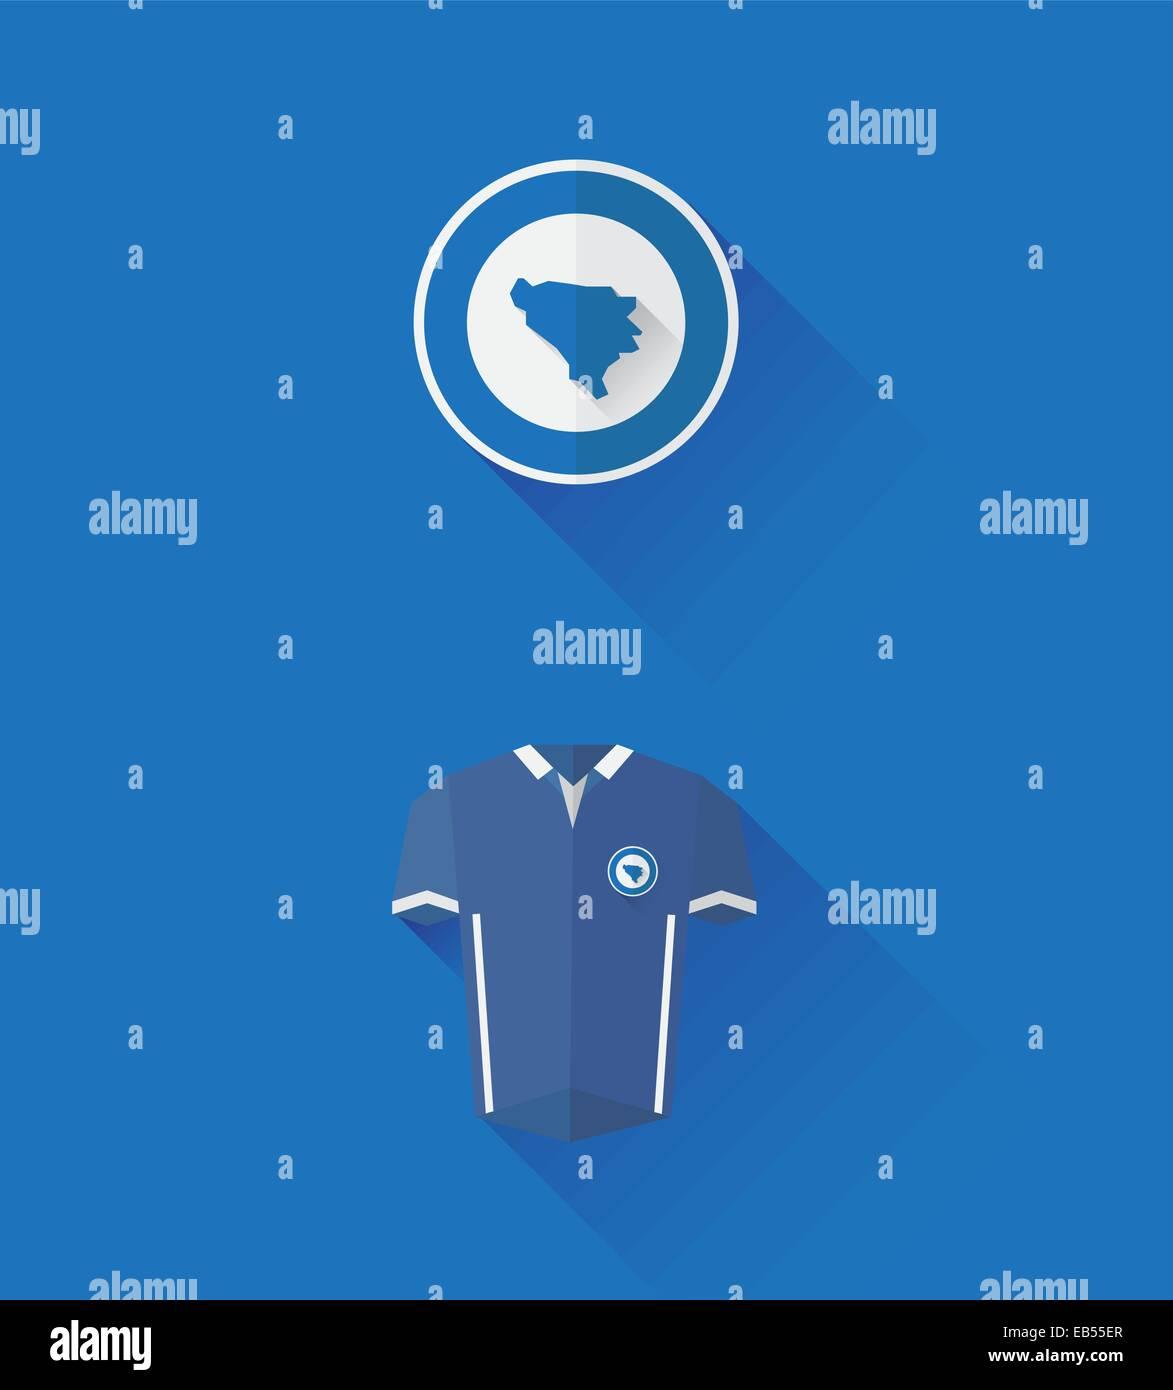 Bosnia jersey and crest vector - Stock Vector